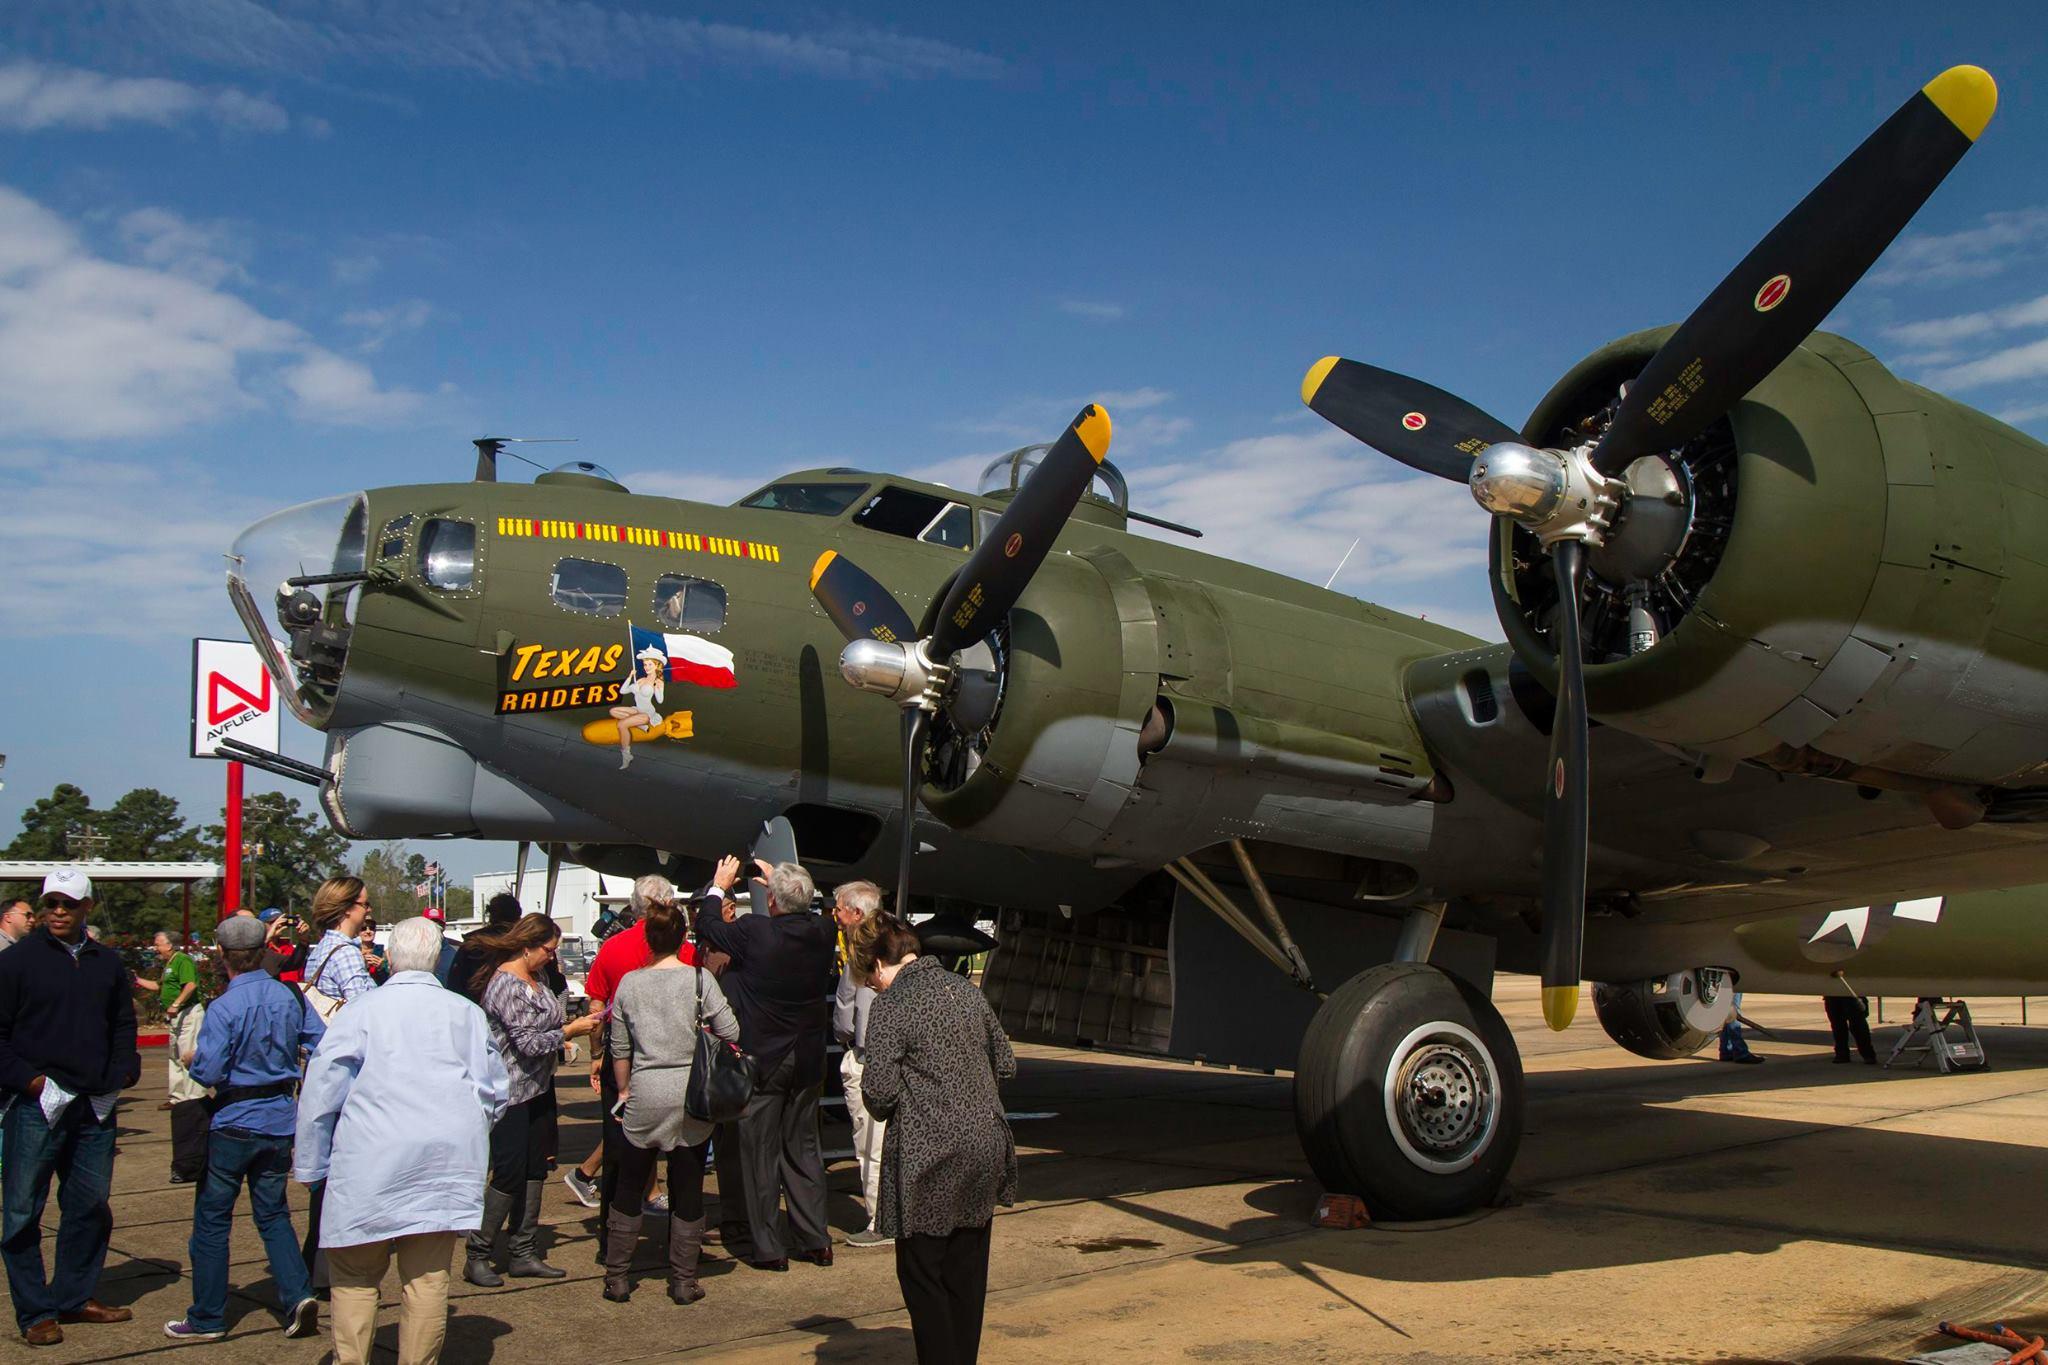 Book your flight on B-17 Texas Raiders NOW !